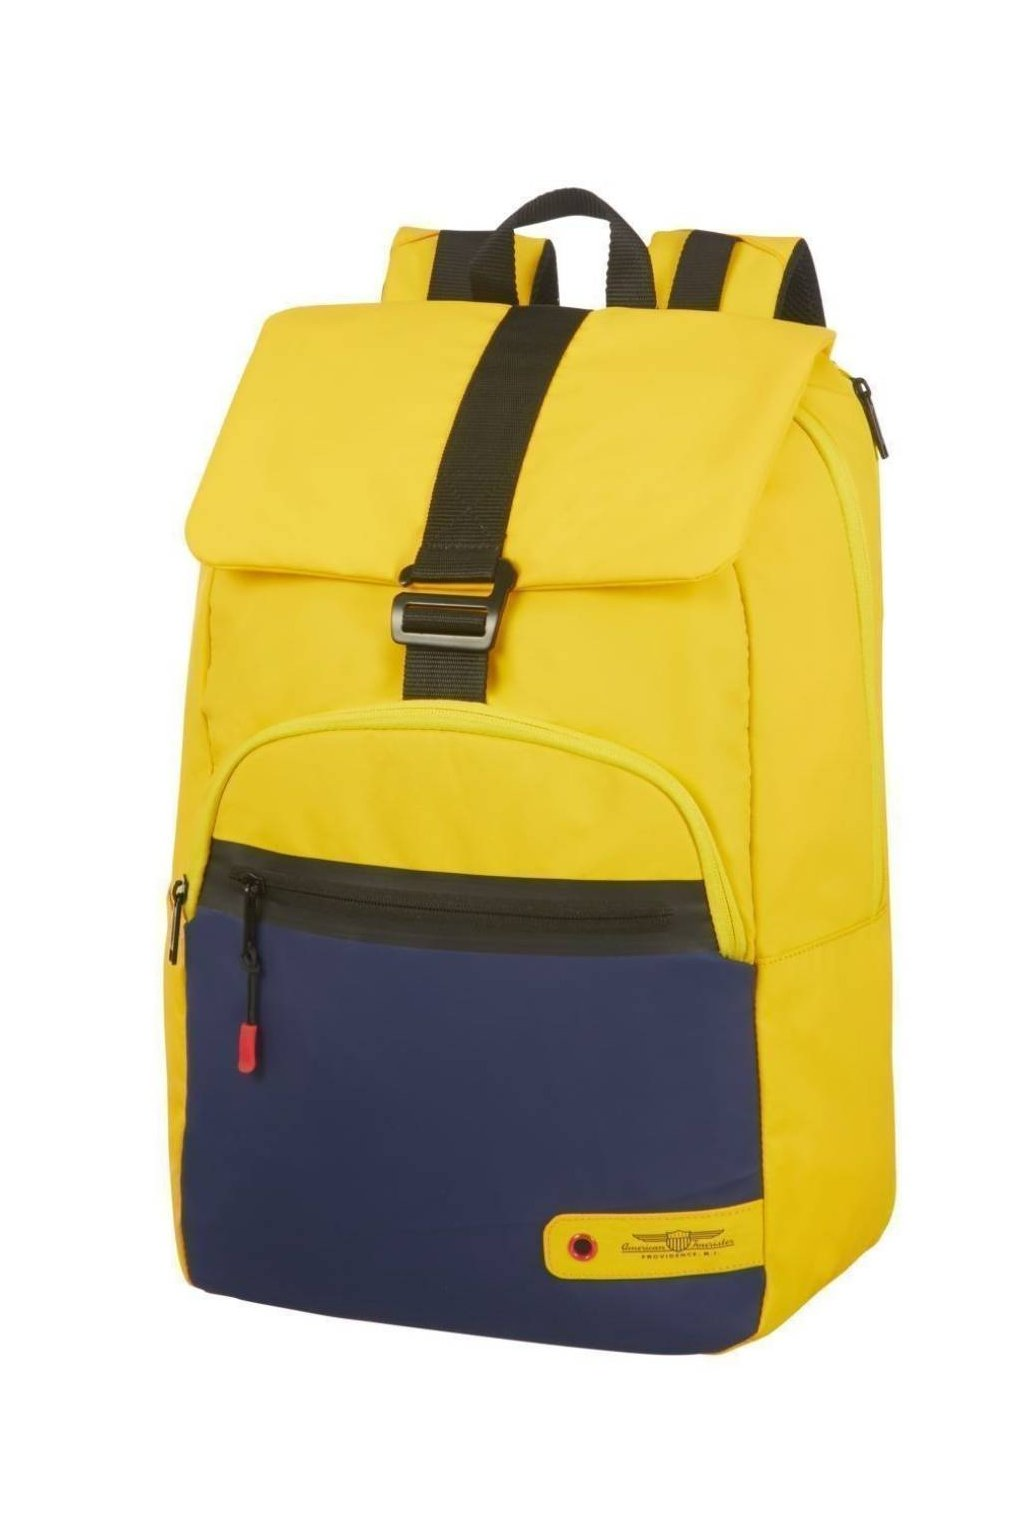 kufrland americantourister cityaim laptopbackpack15.6 yellow blue1